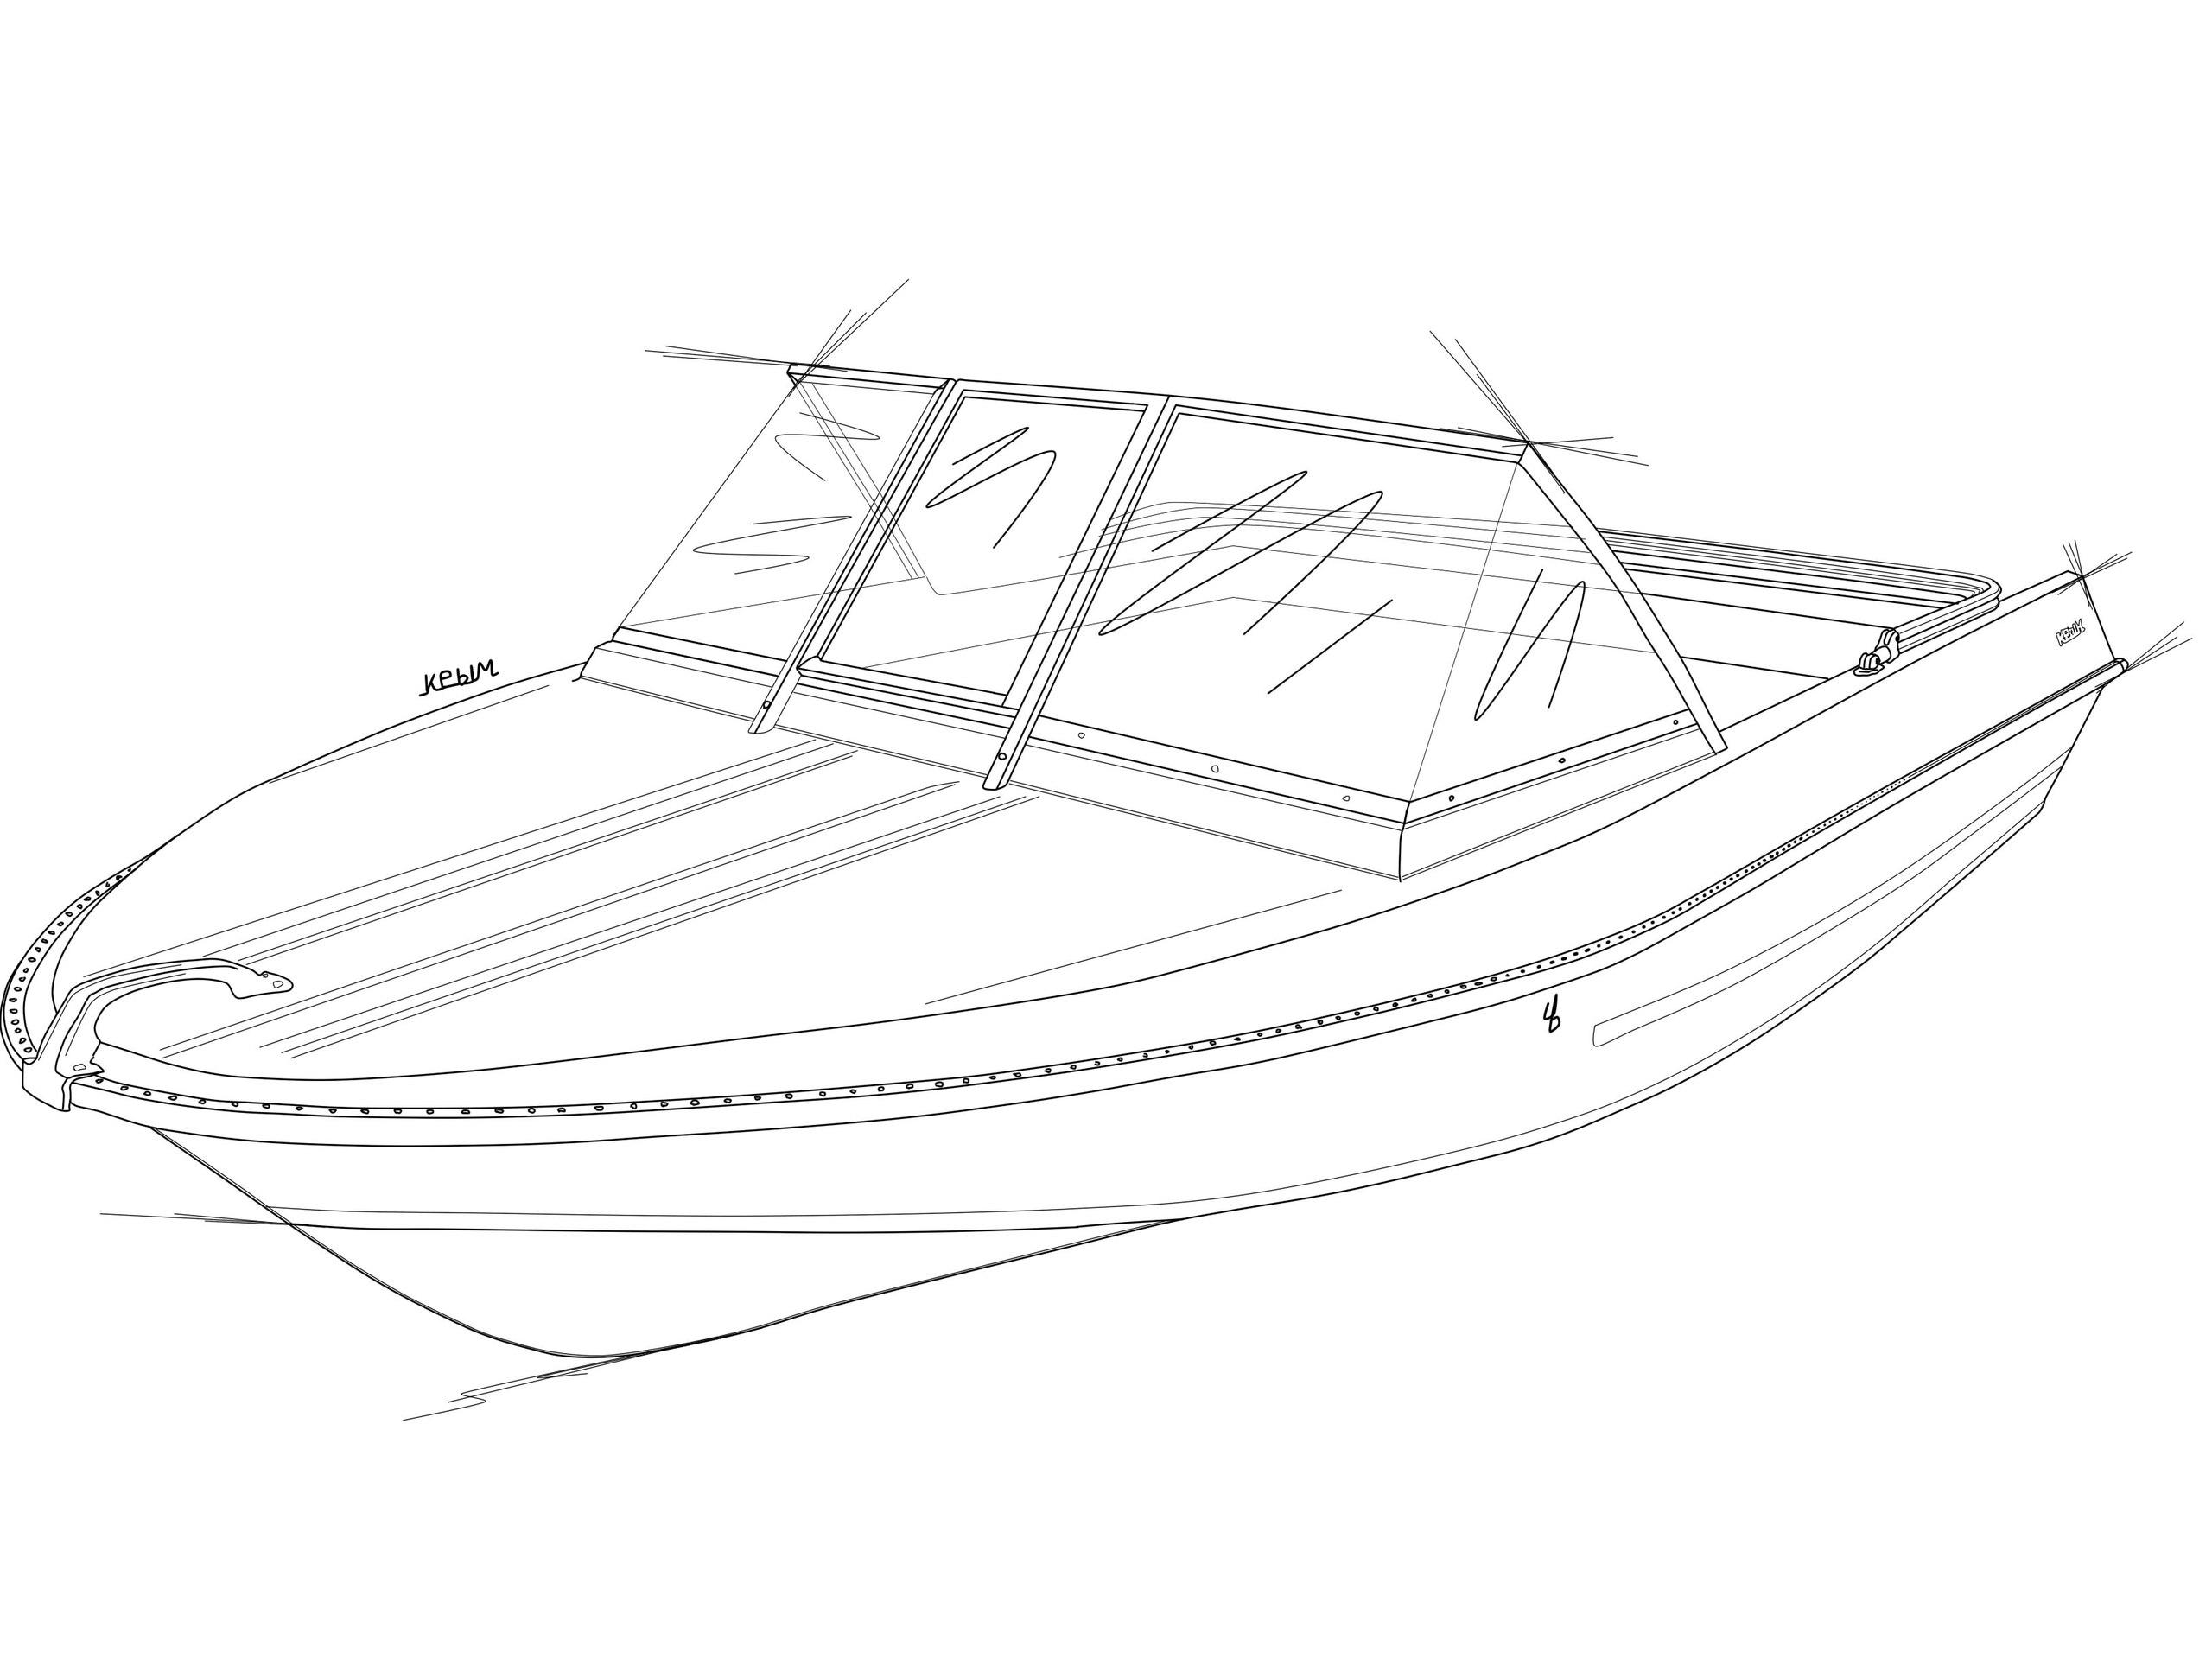 Стекло и тент для лодки Крым 1